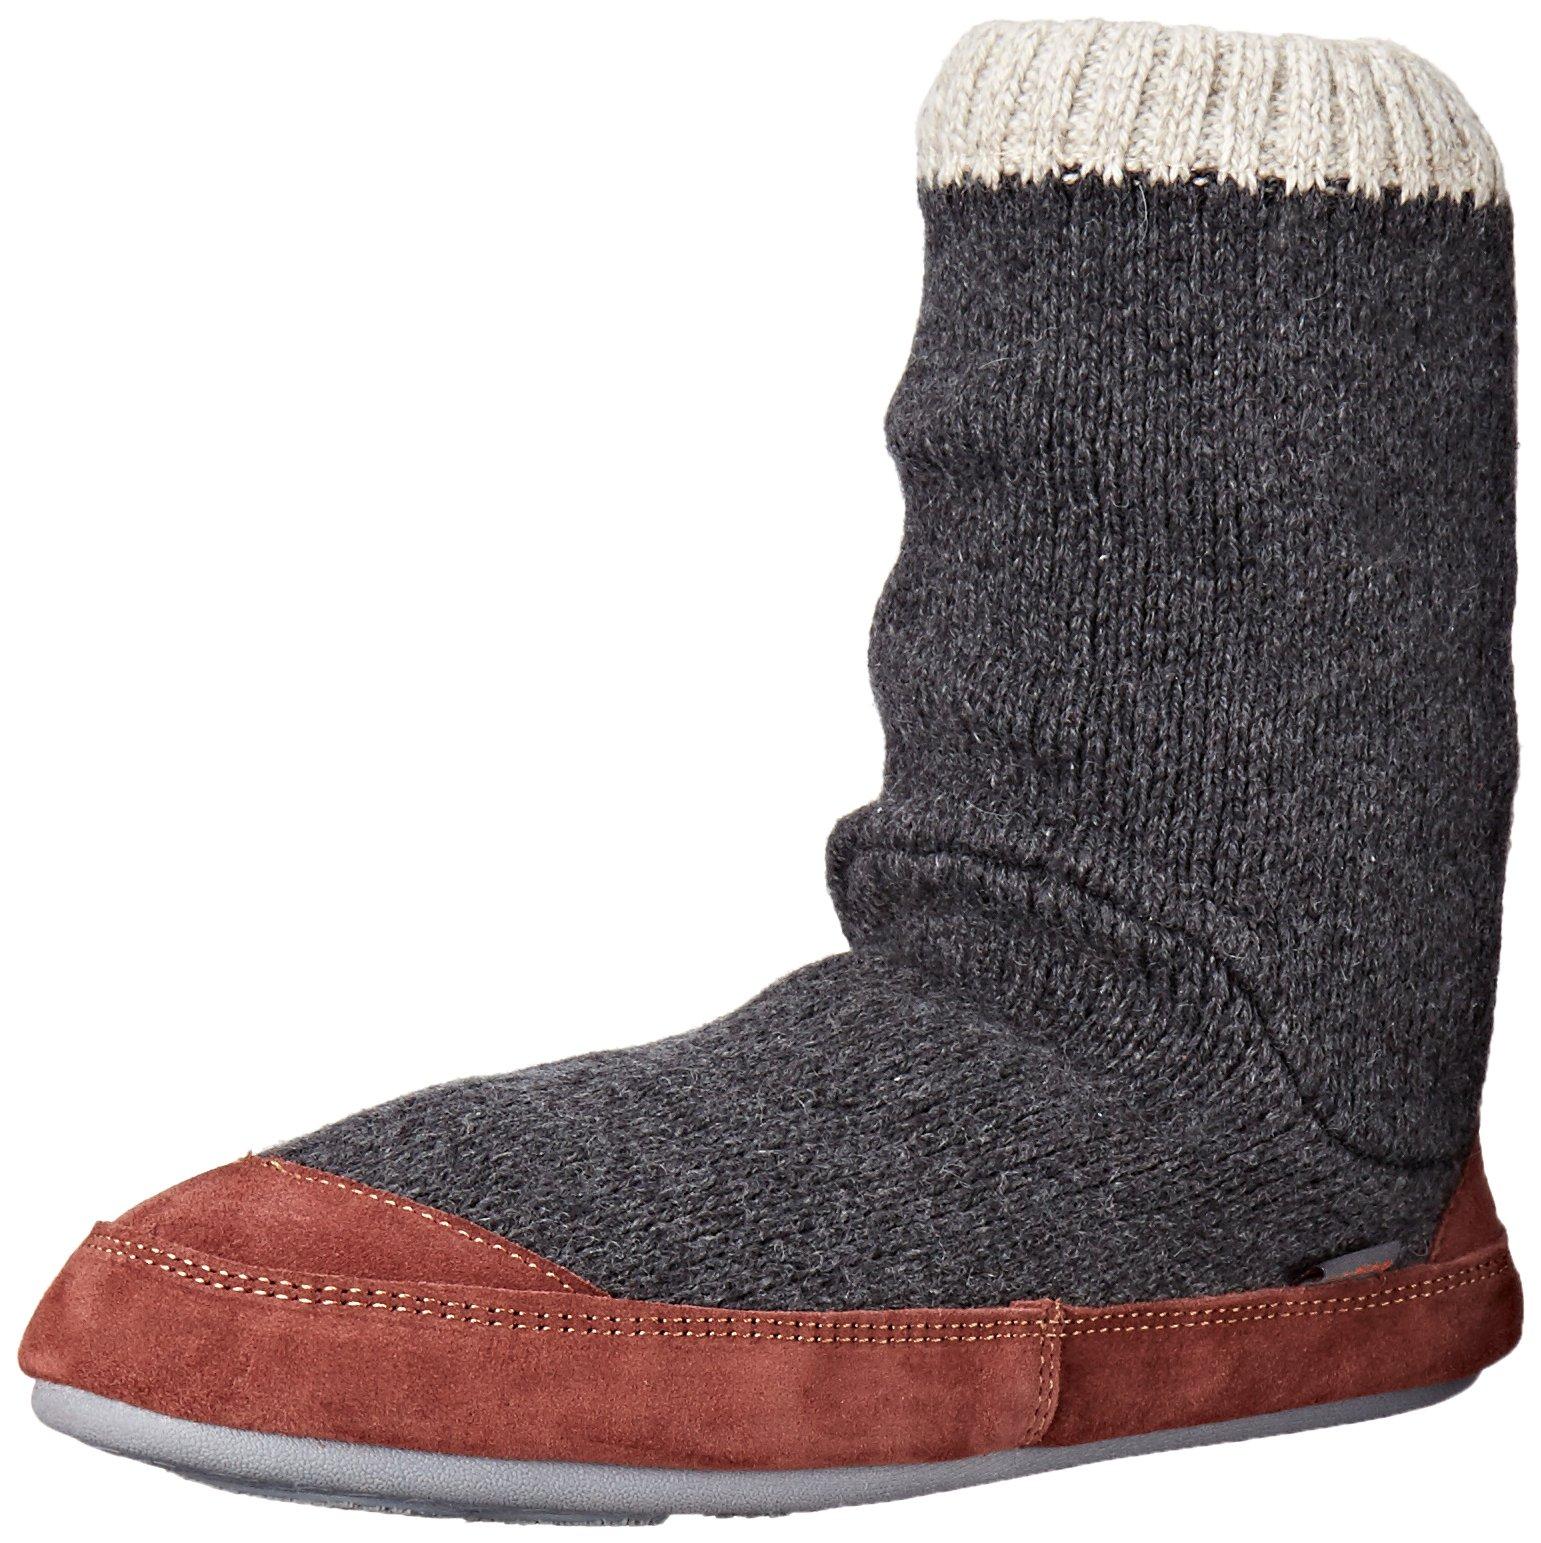 Acorn Men's Slouch Boot Slipper, Charcoal Ragg Wool, Large/10.5-11.5 B US